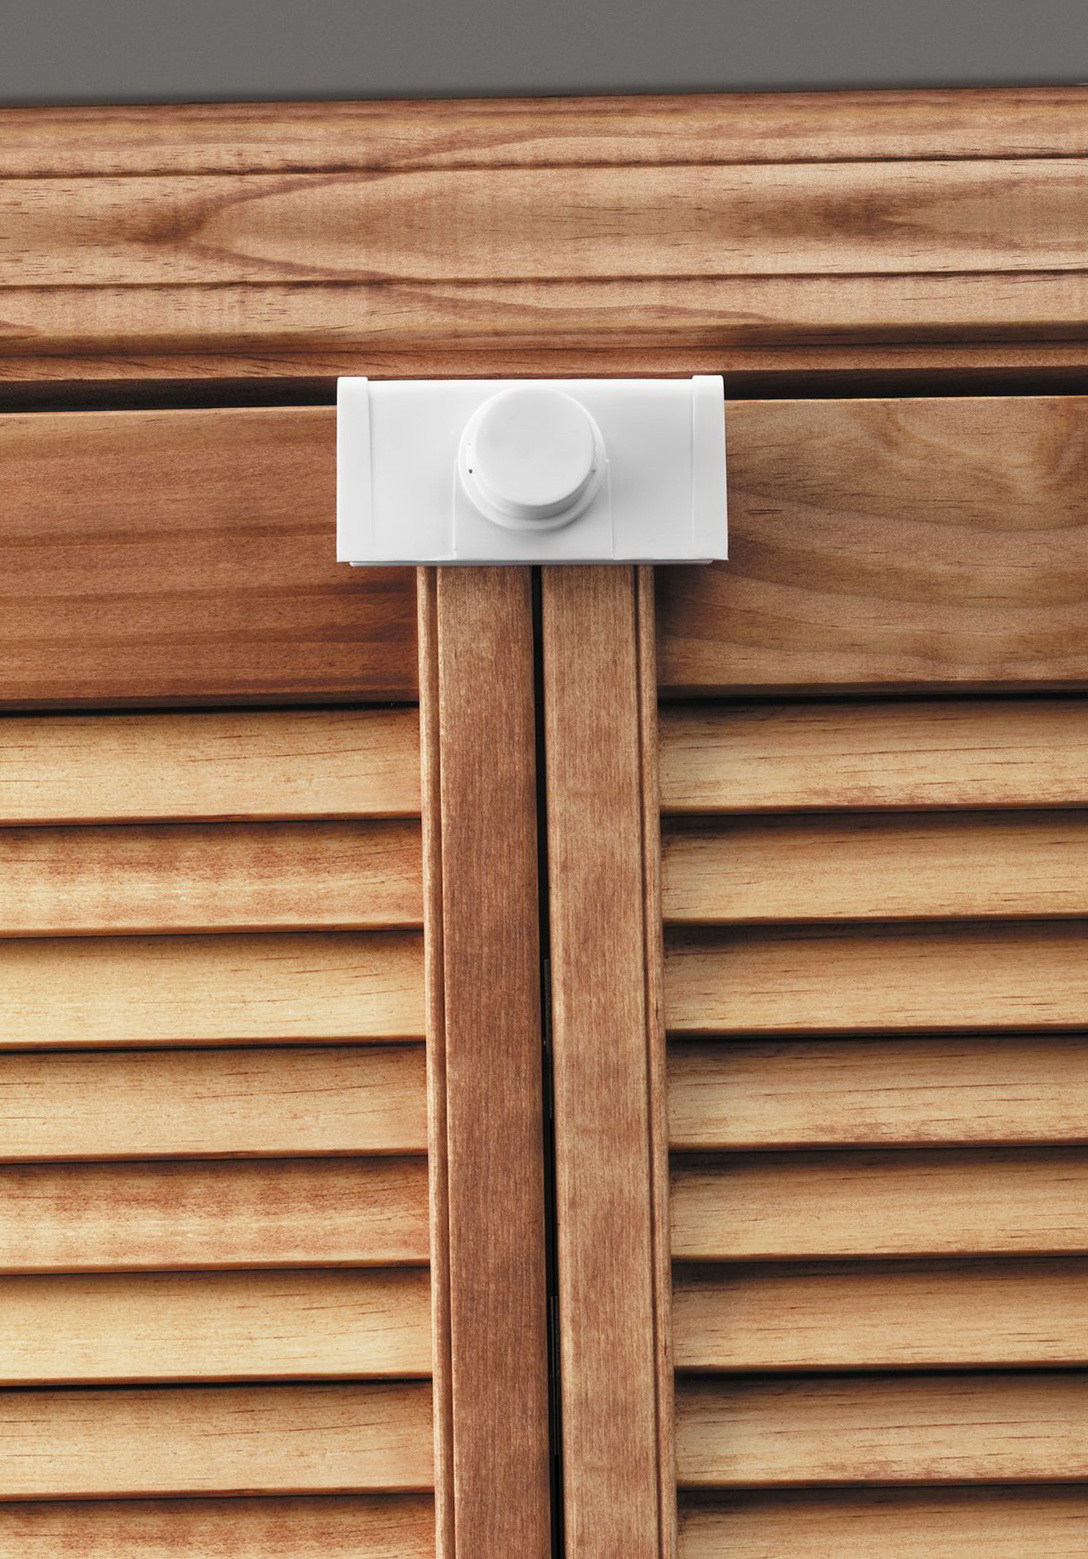 Folding Closet Door Lock Home Design Ideas